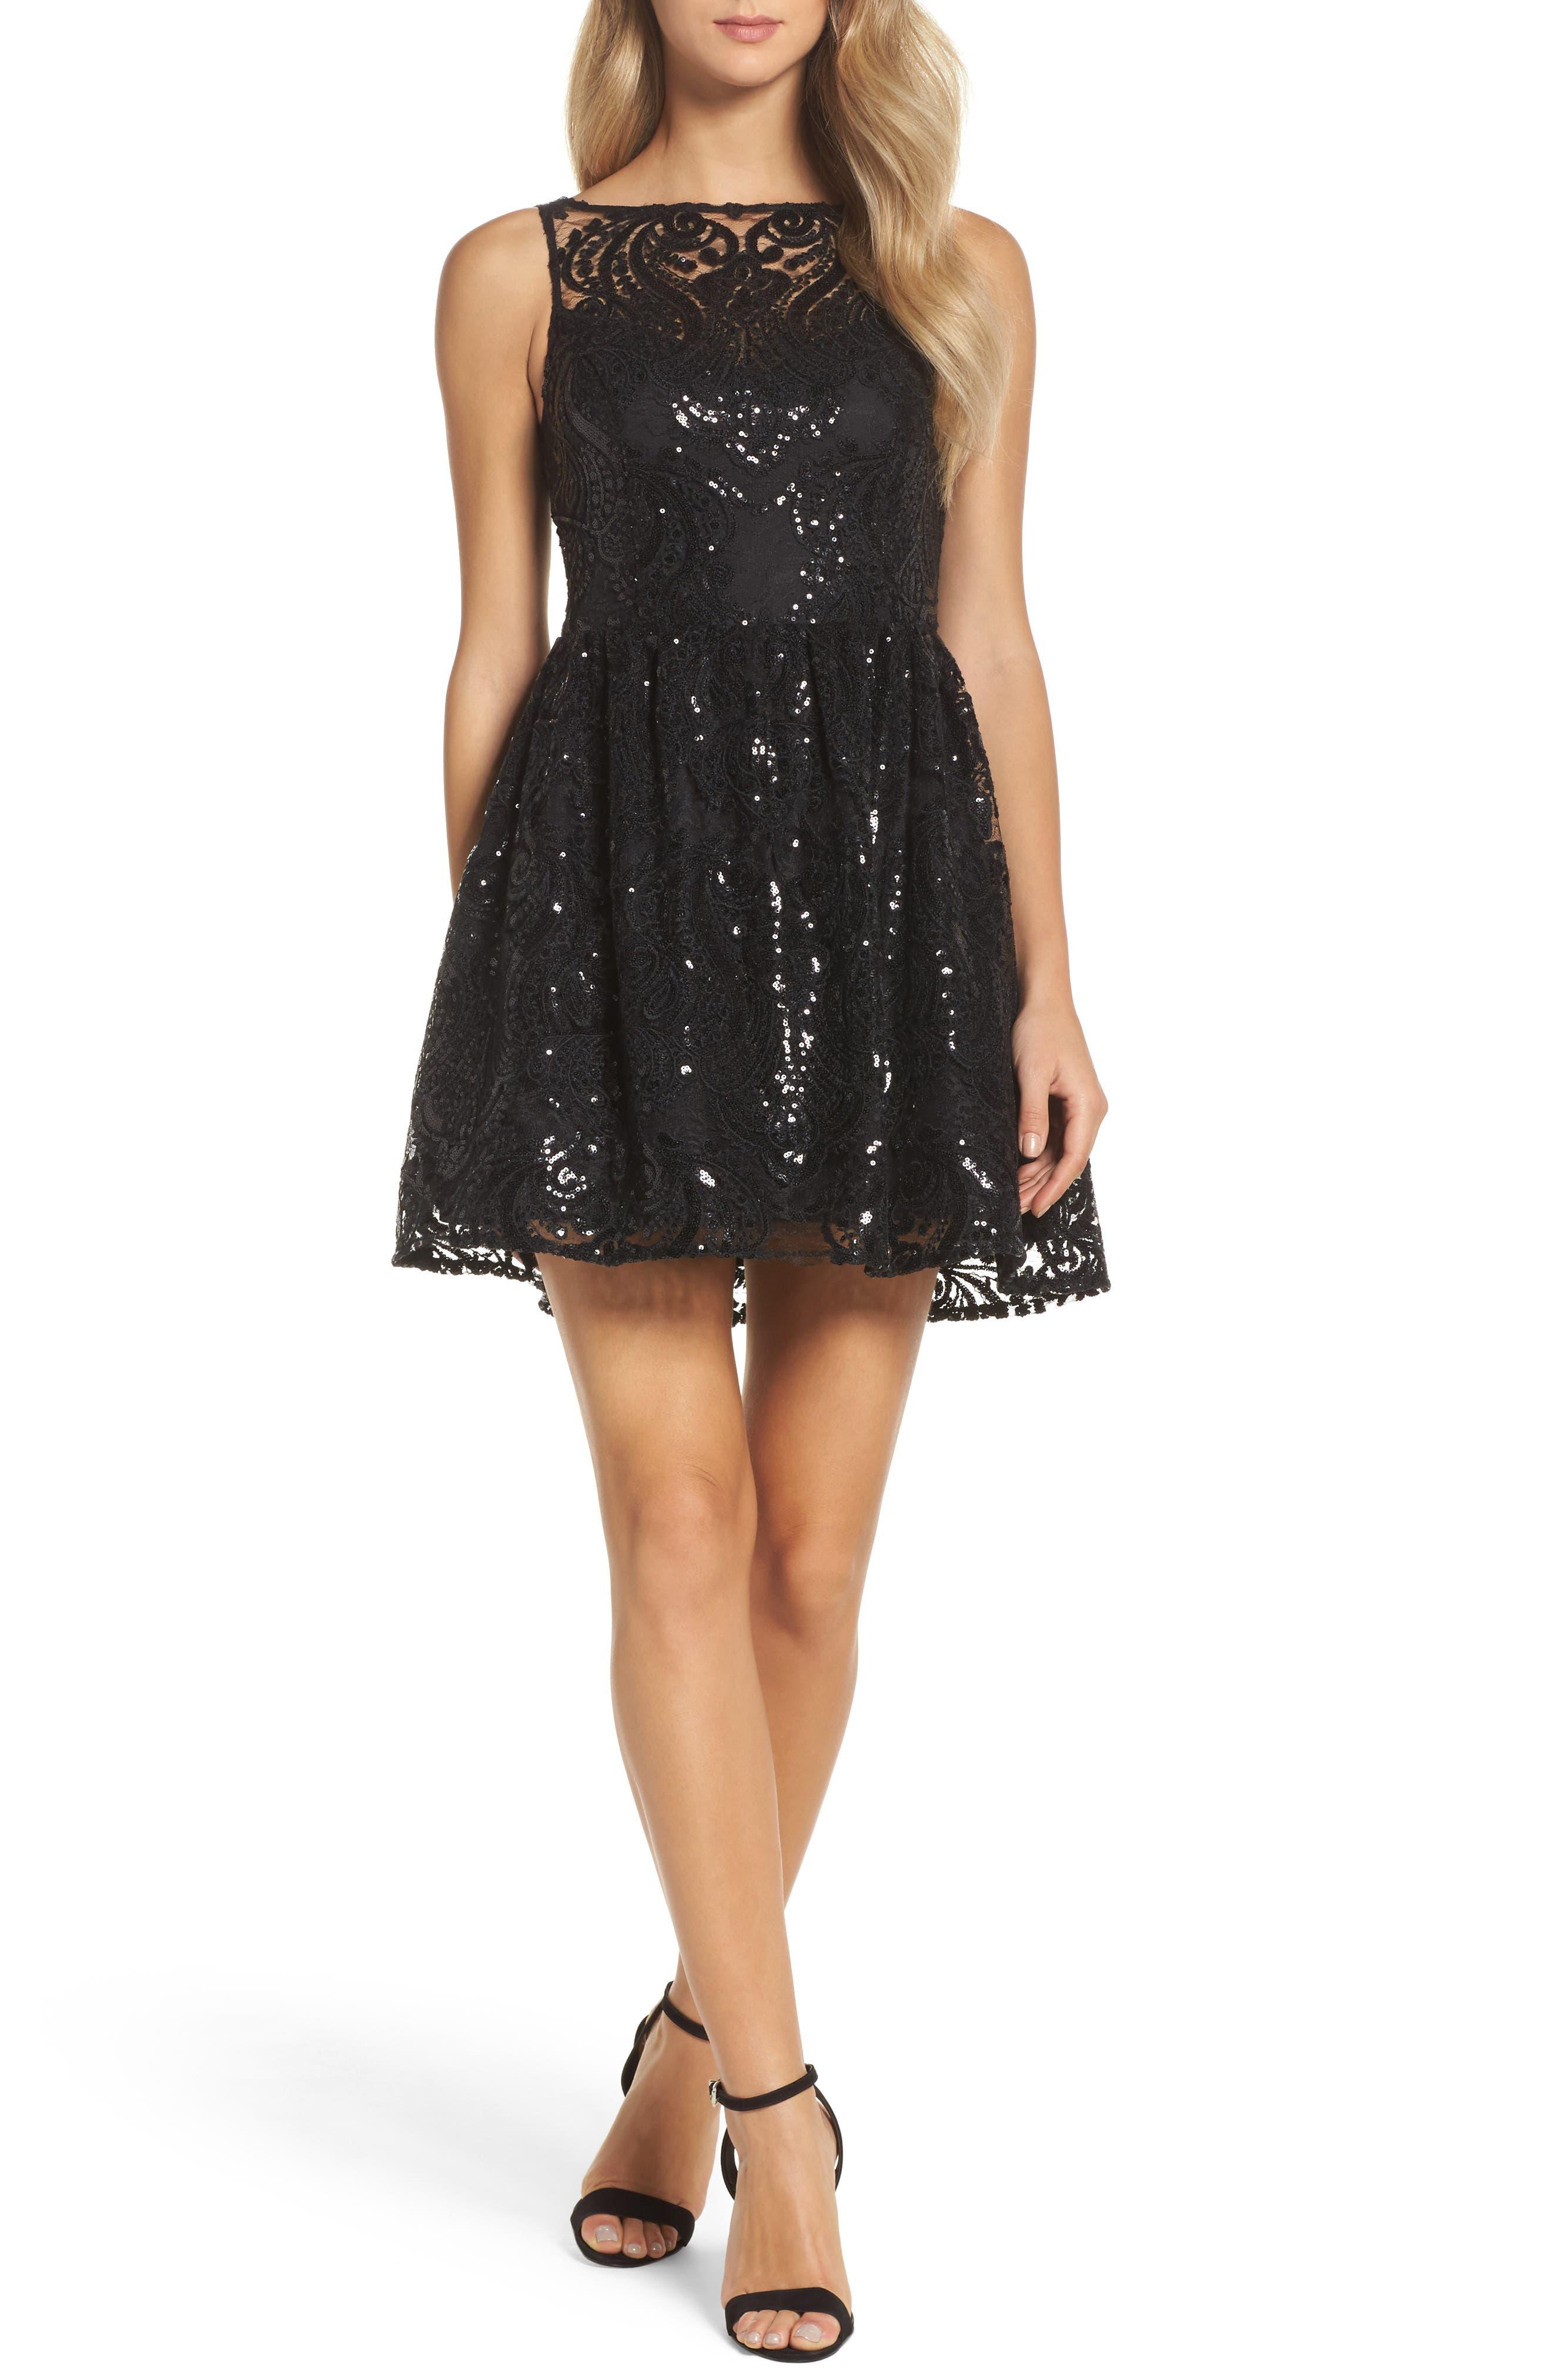 BB Dakota Tate Sequin Lace Fit & Flare Dress